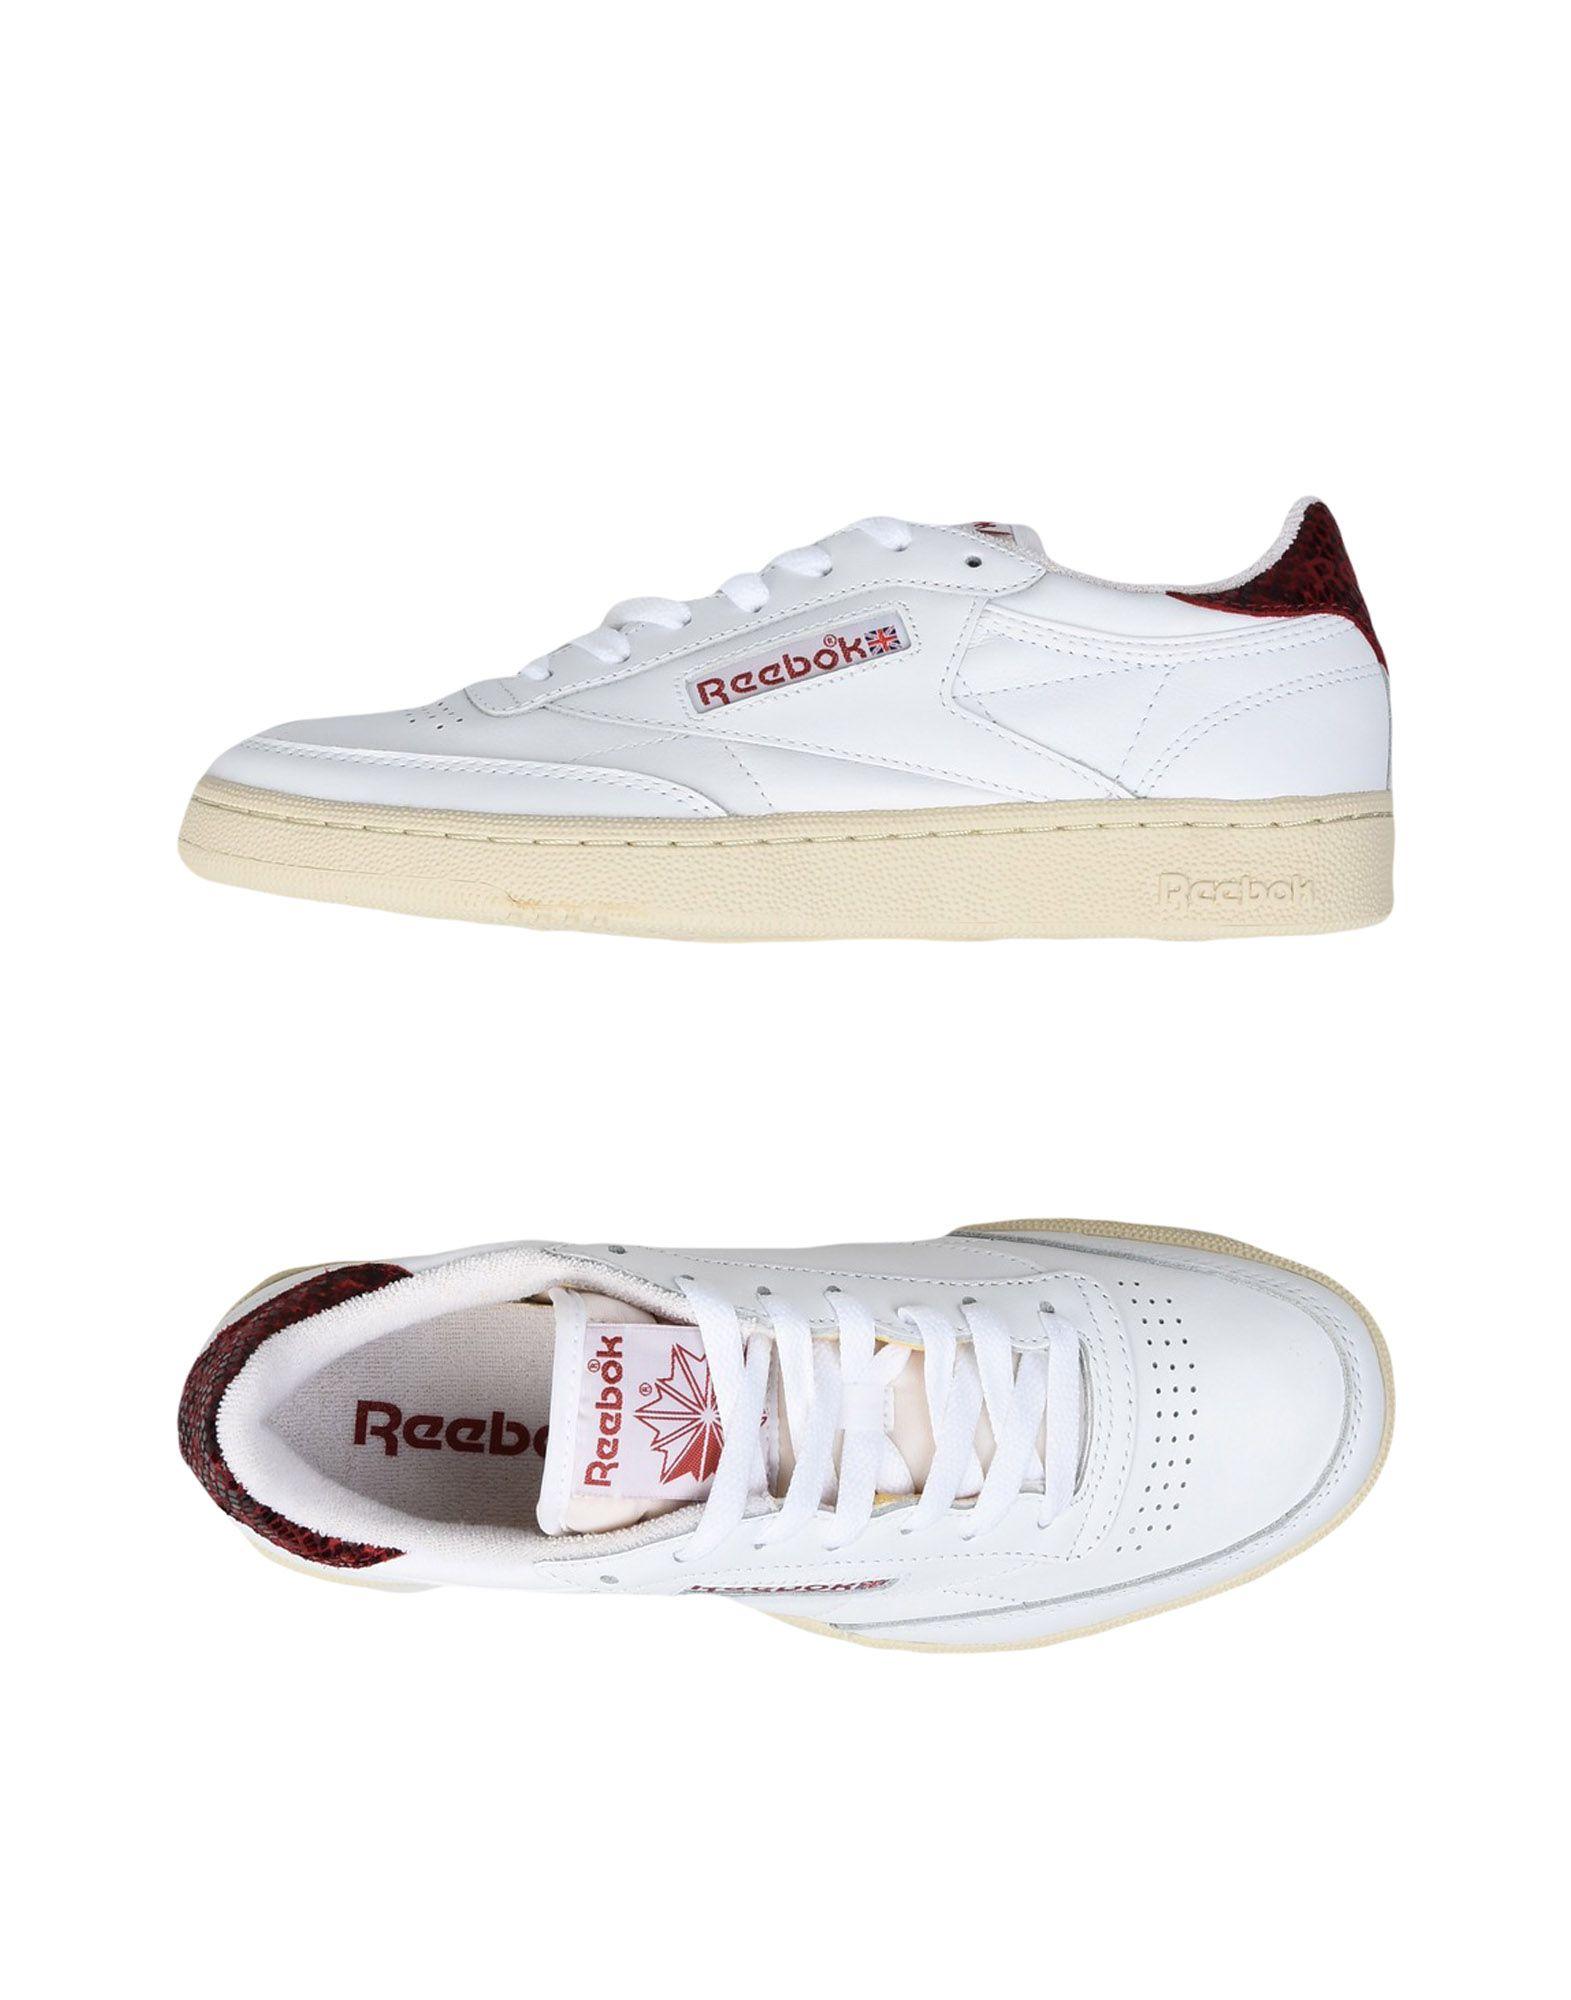 Reebok Club C 85 Vs  11238909EB Gute Qualität beliebte Schuhe